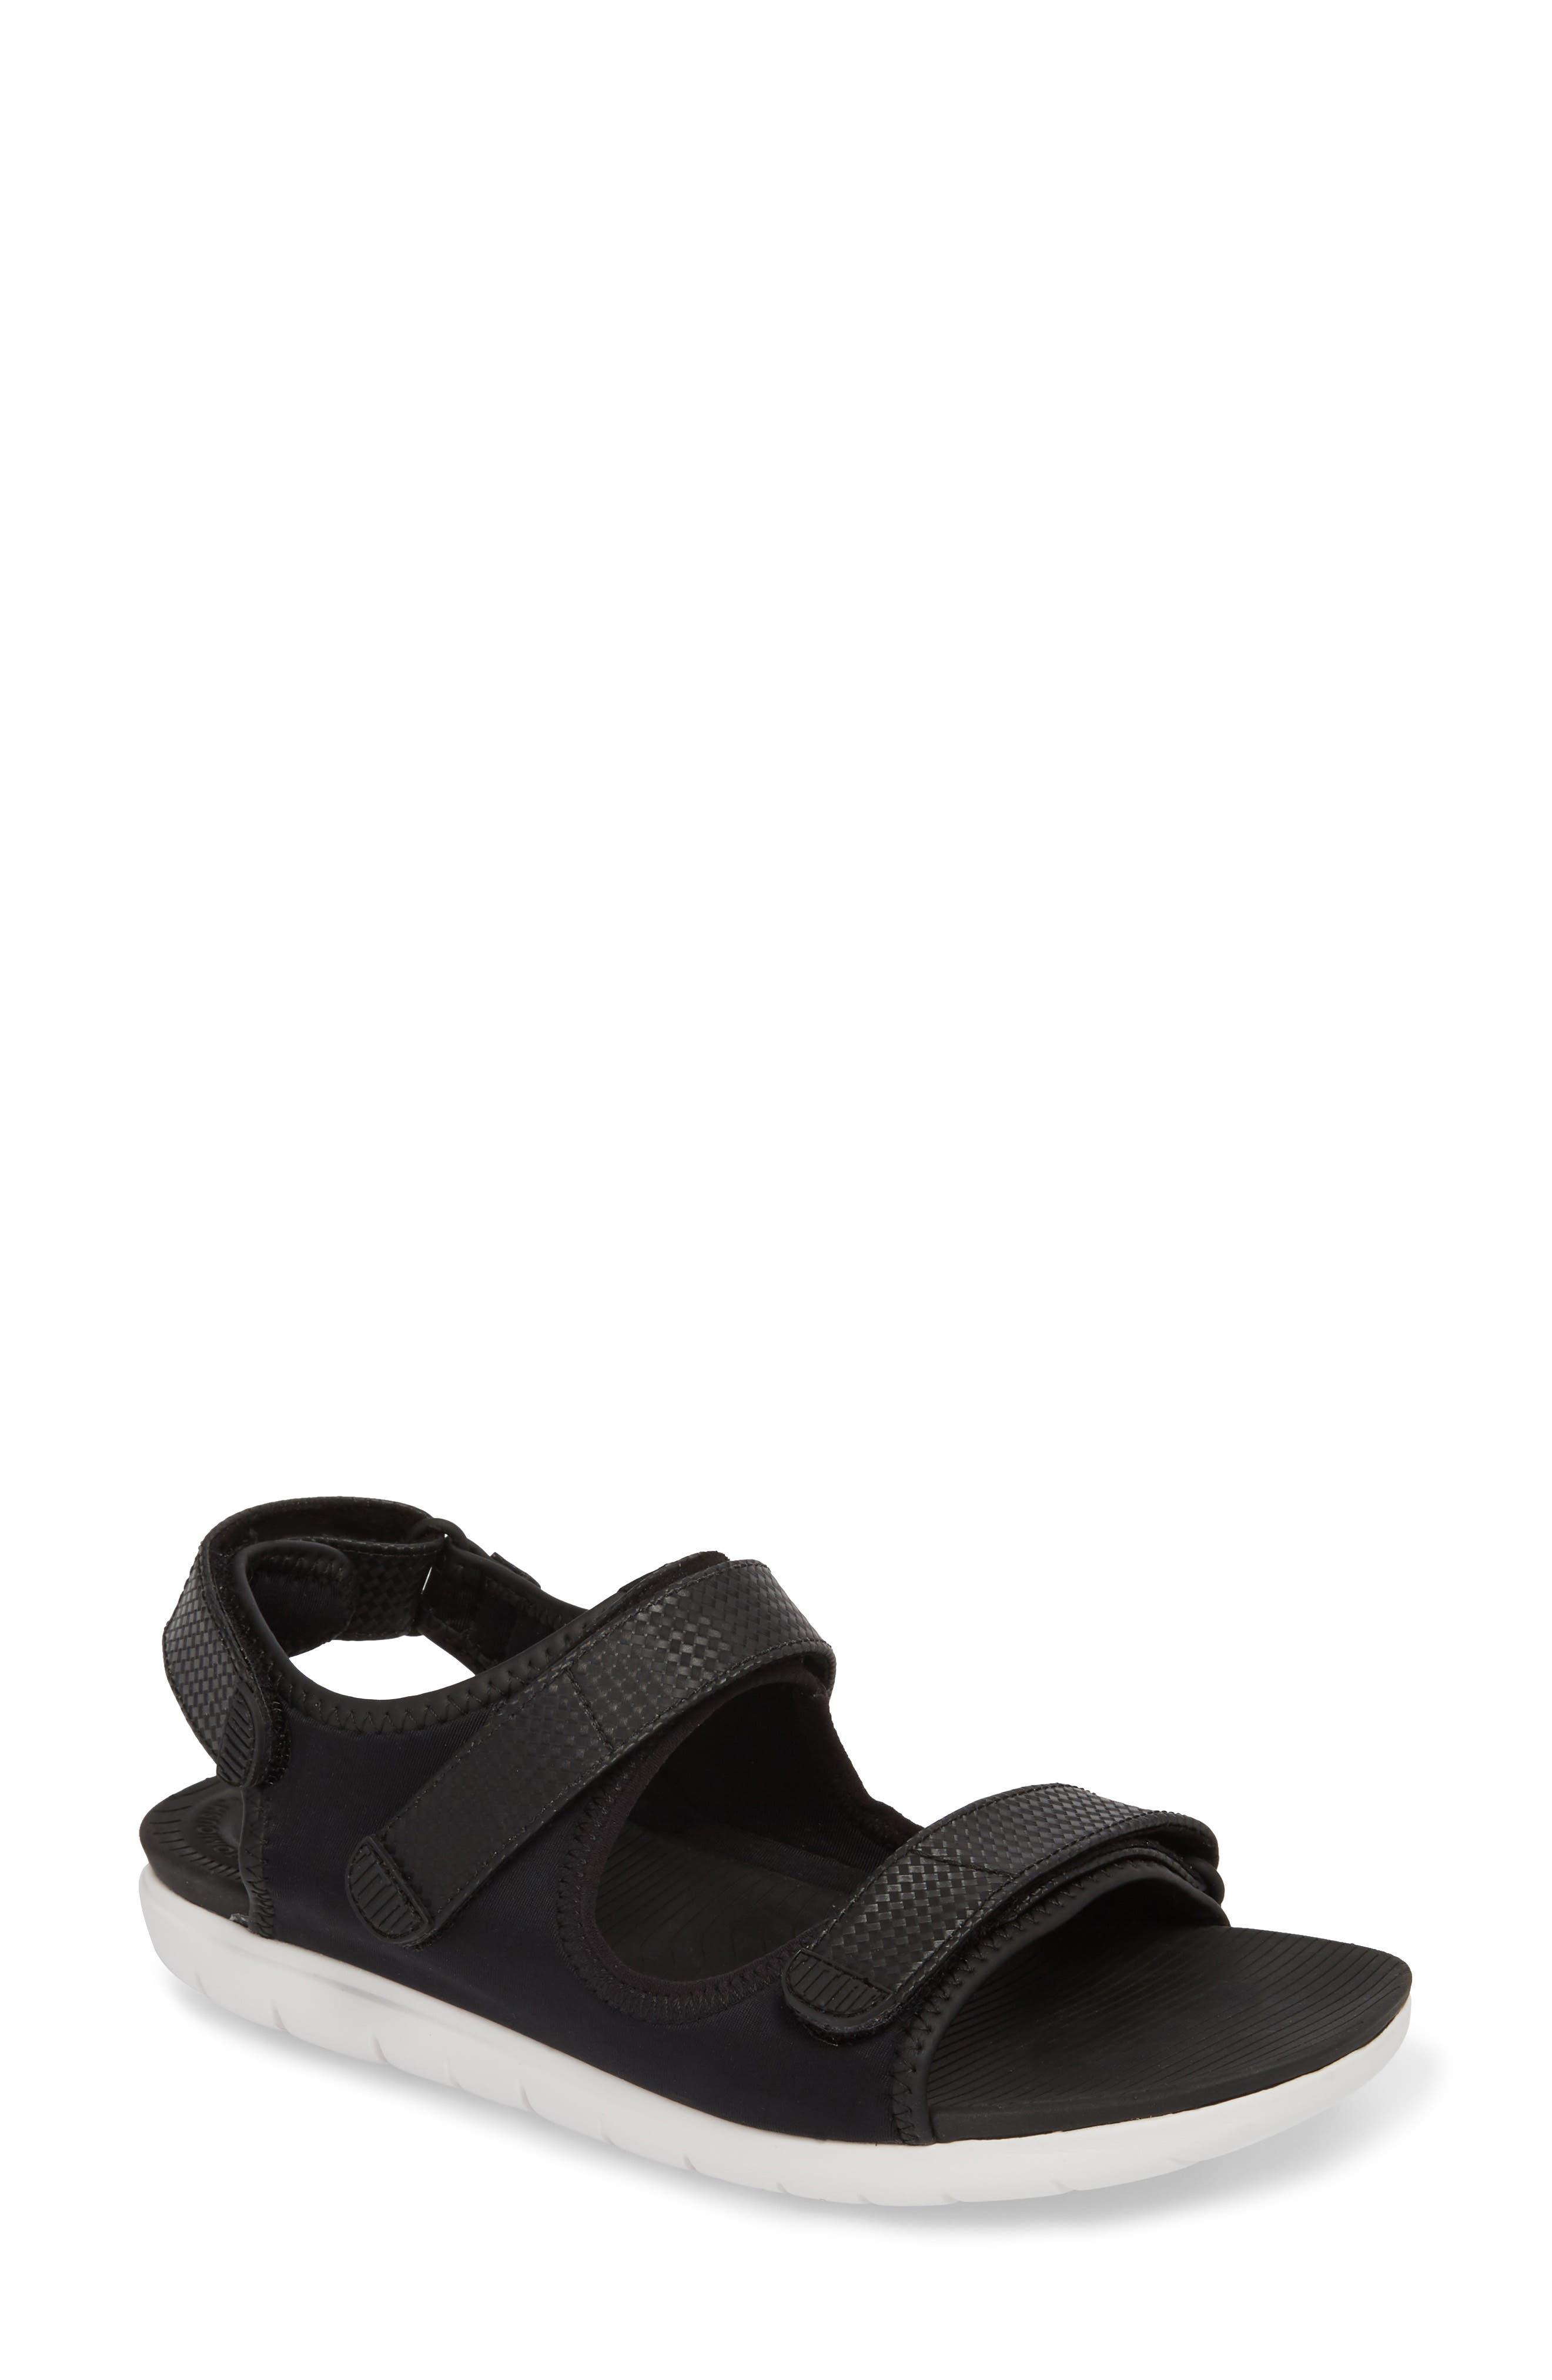 FitfFlop Neoflex<sup>™</sup> Back Strap Sandal,                             Main thumbnail 1, color,                             Black Leather